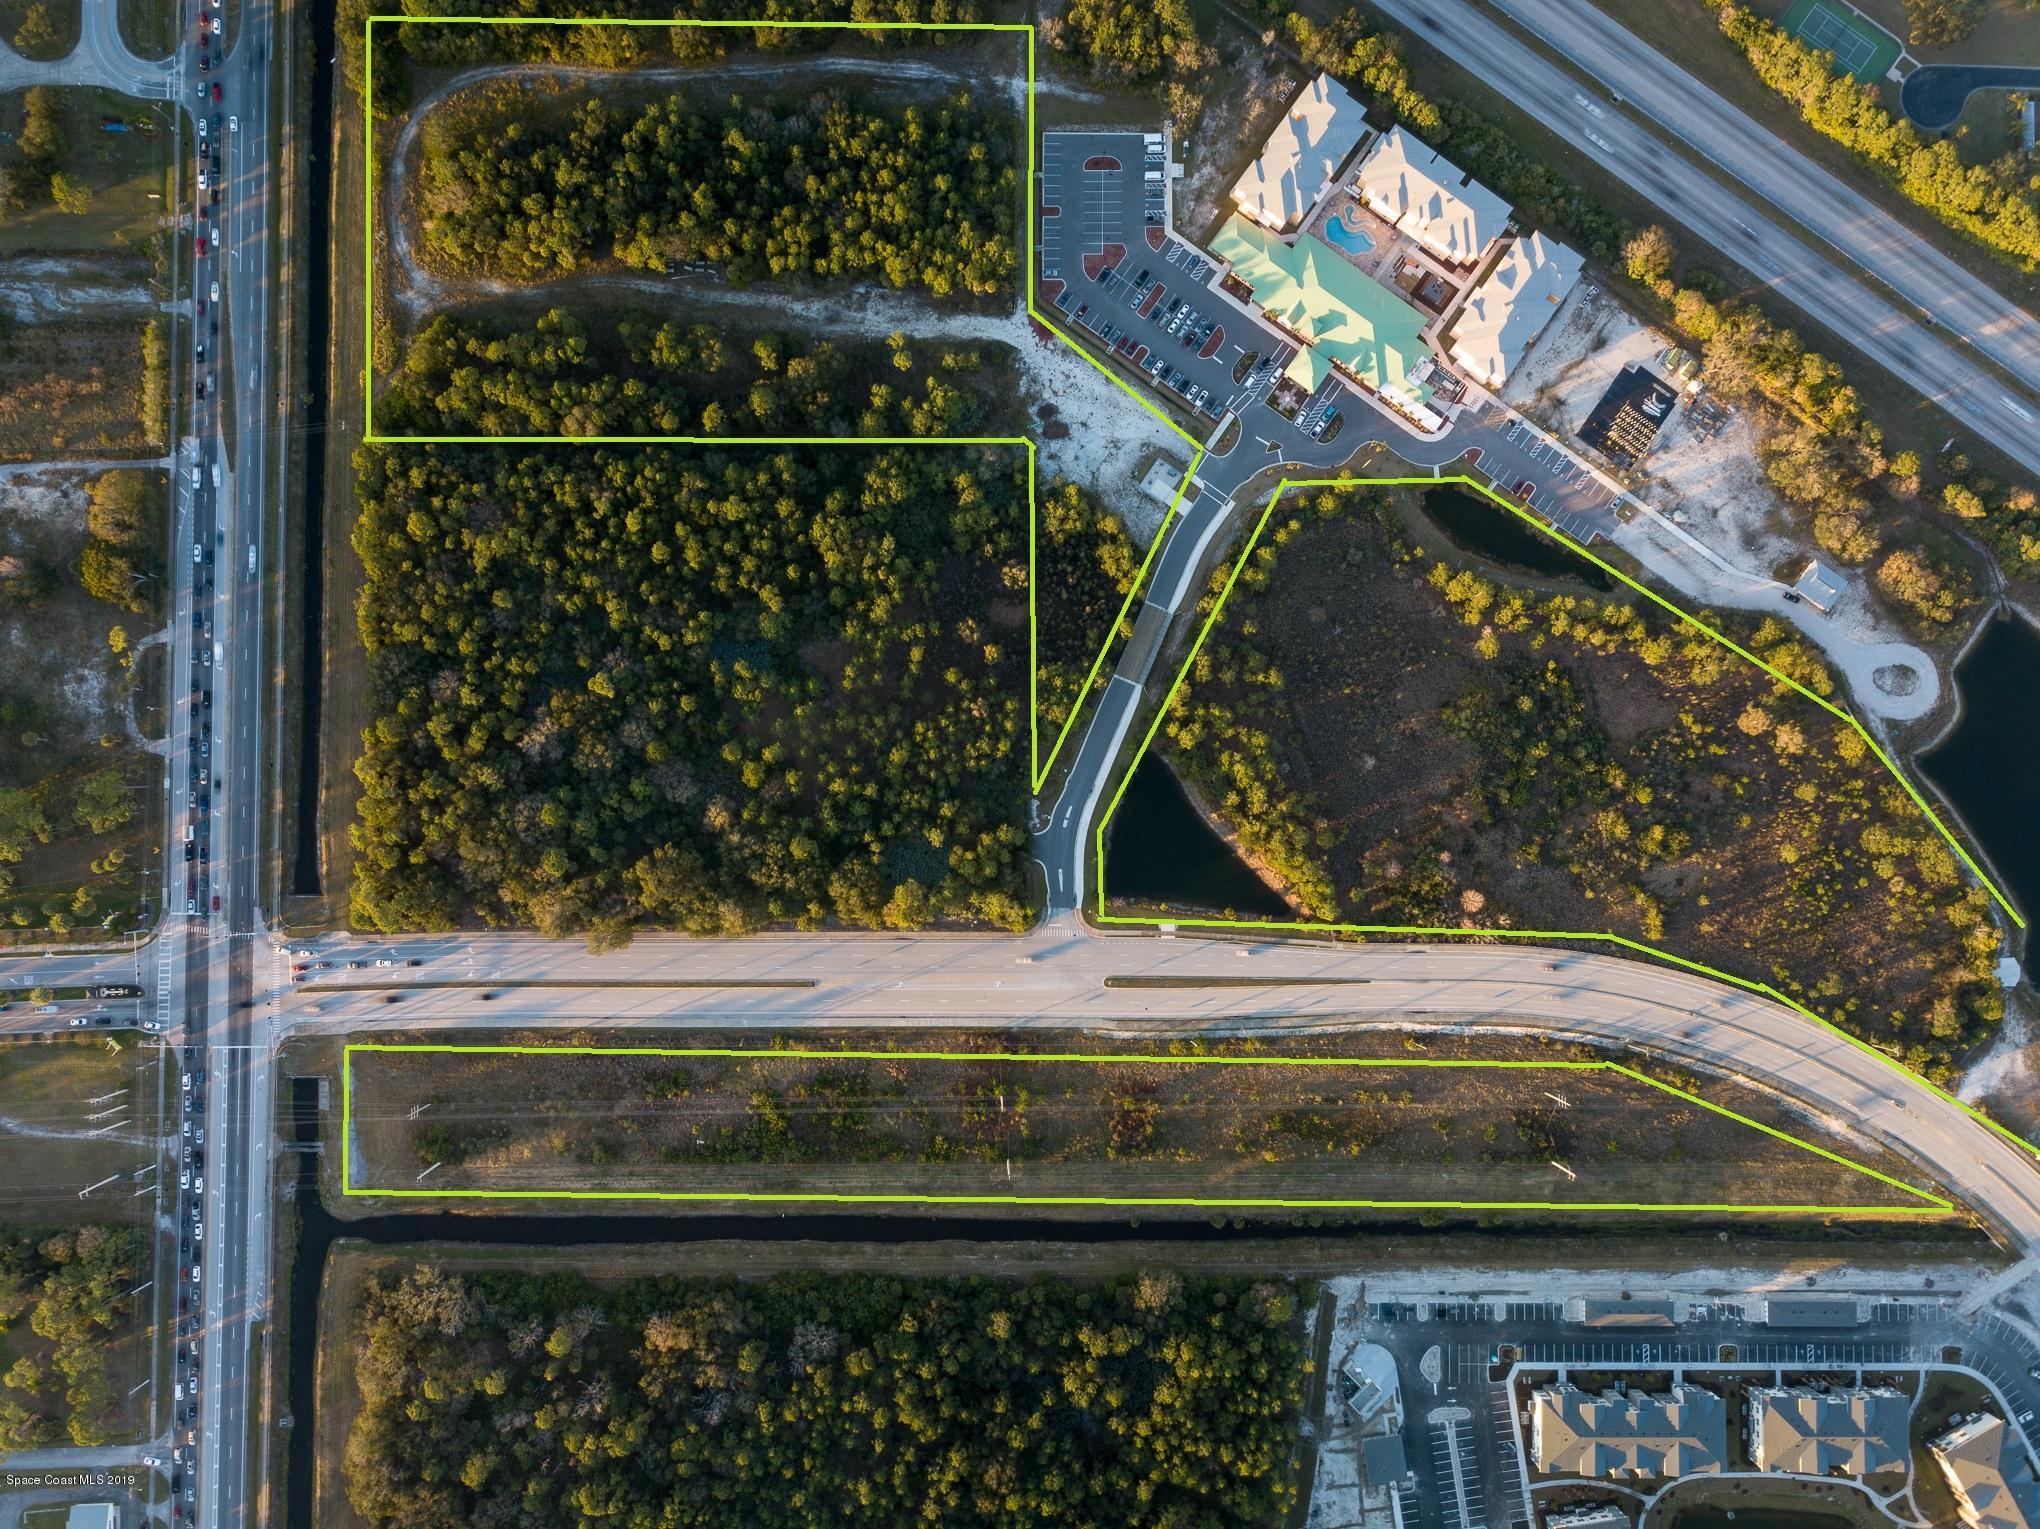 Đất đai vì Bán tại Norfolk West Melbourne, Florida 32904 Hoa Kỳ